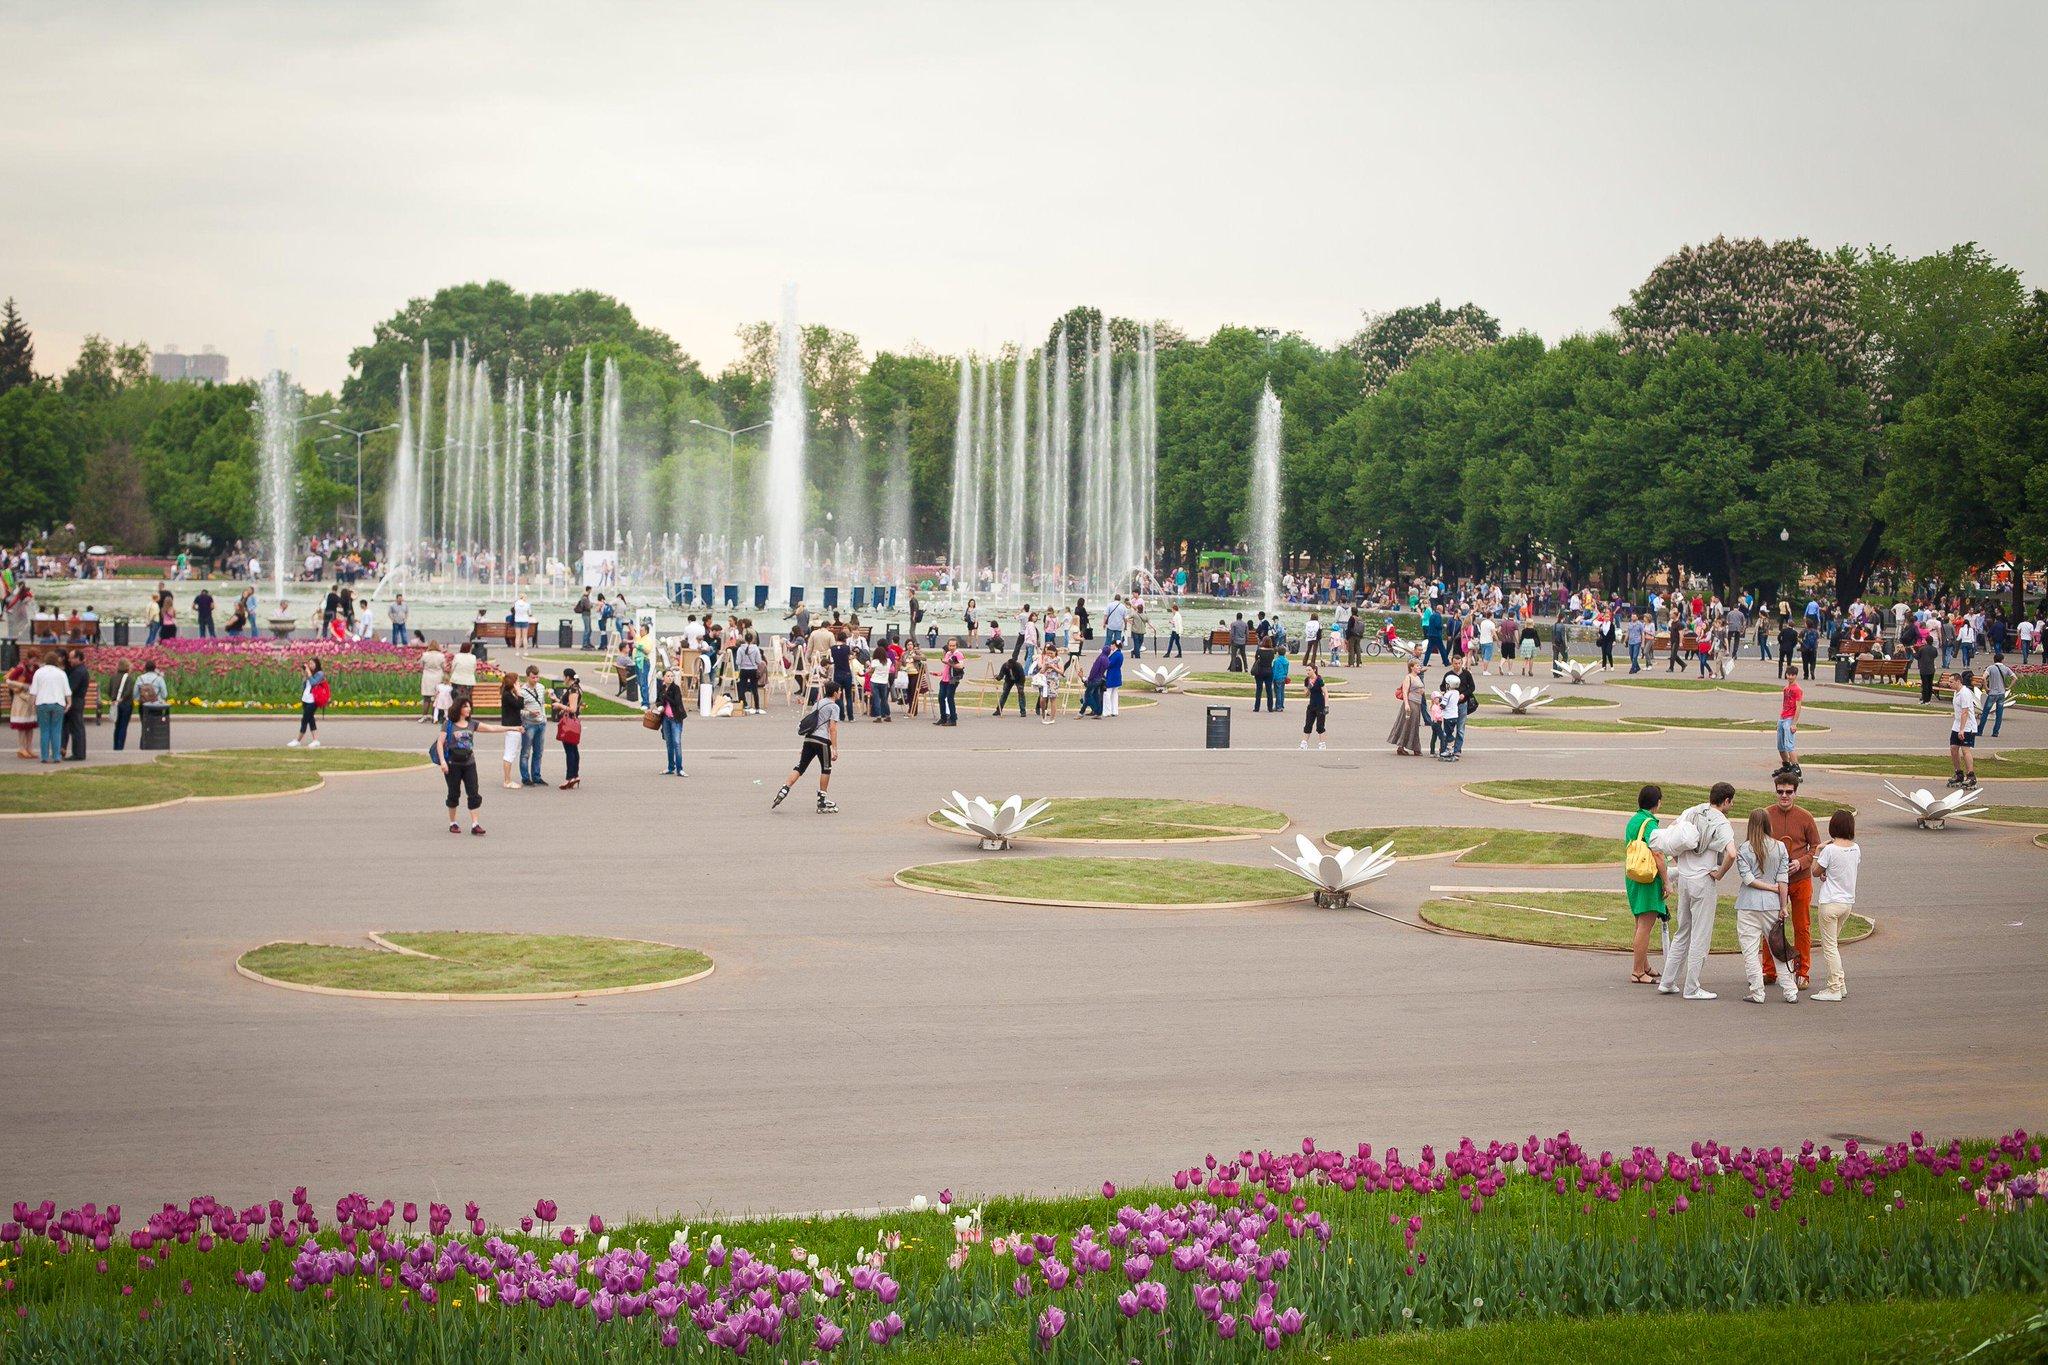 существенно парки москвы фото с названиями самый широкий диапазон